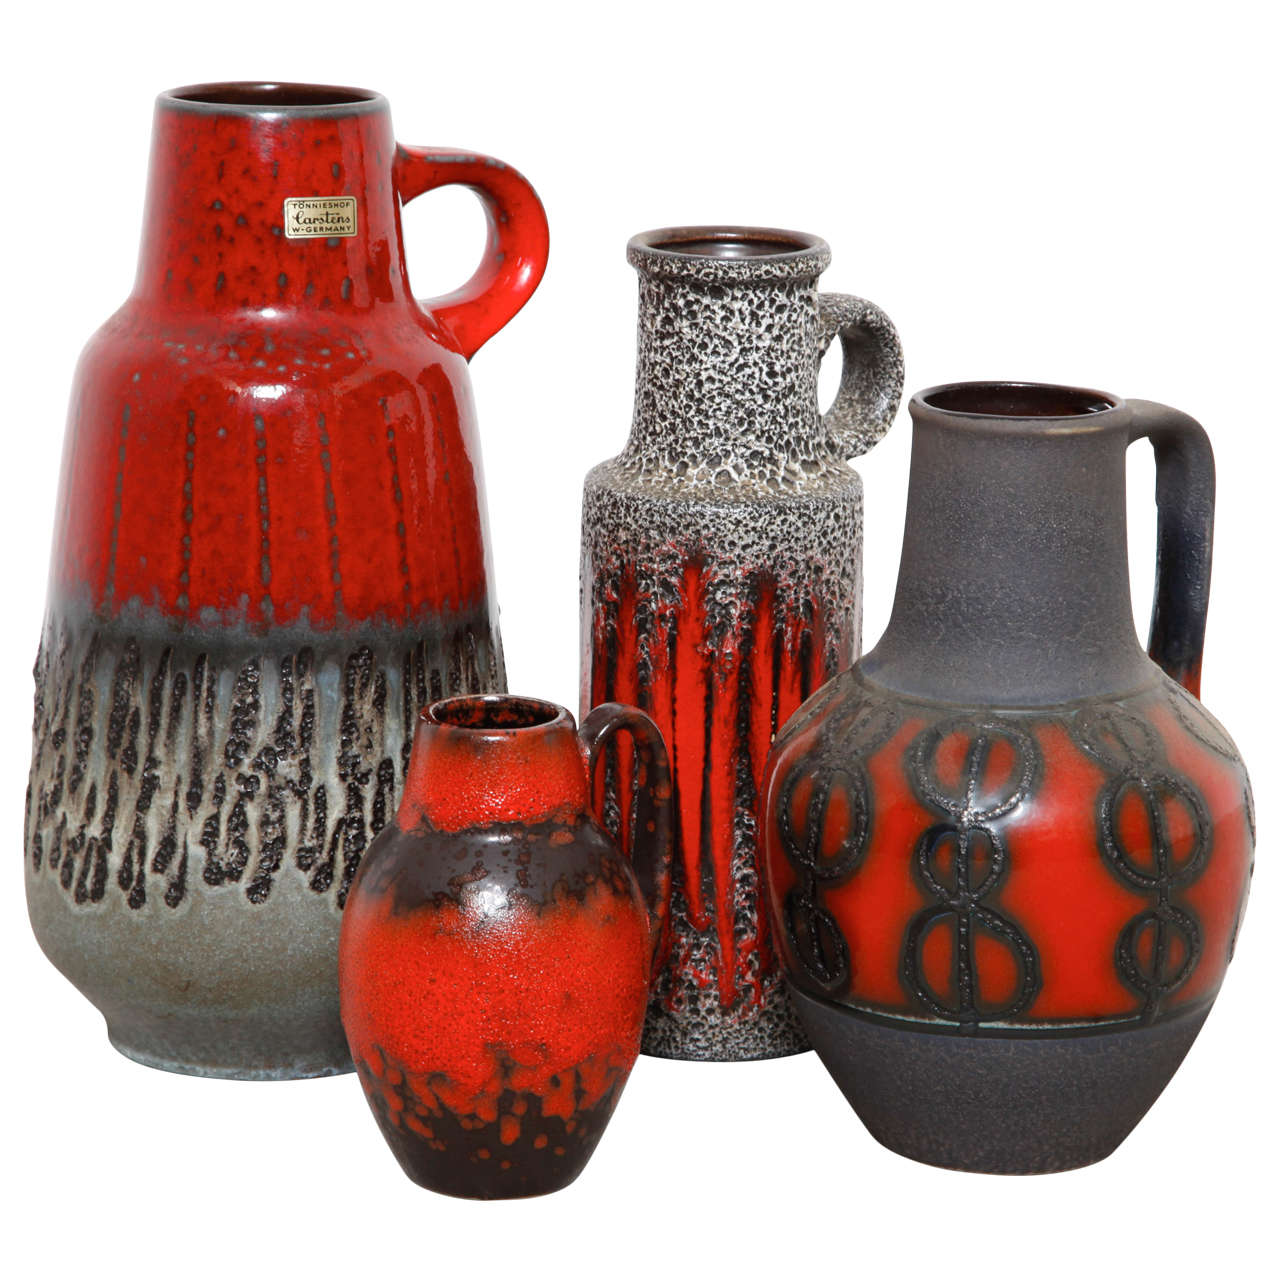 Set of four carstens tnnieshof ceramic floor vases made in west set of four carstens tnnieshof ceramic floor vases made in west germany for sale reviewsmspy